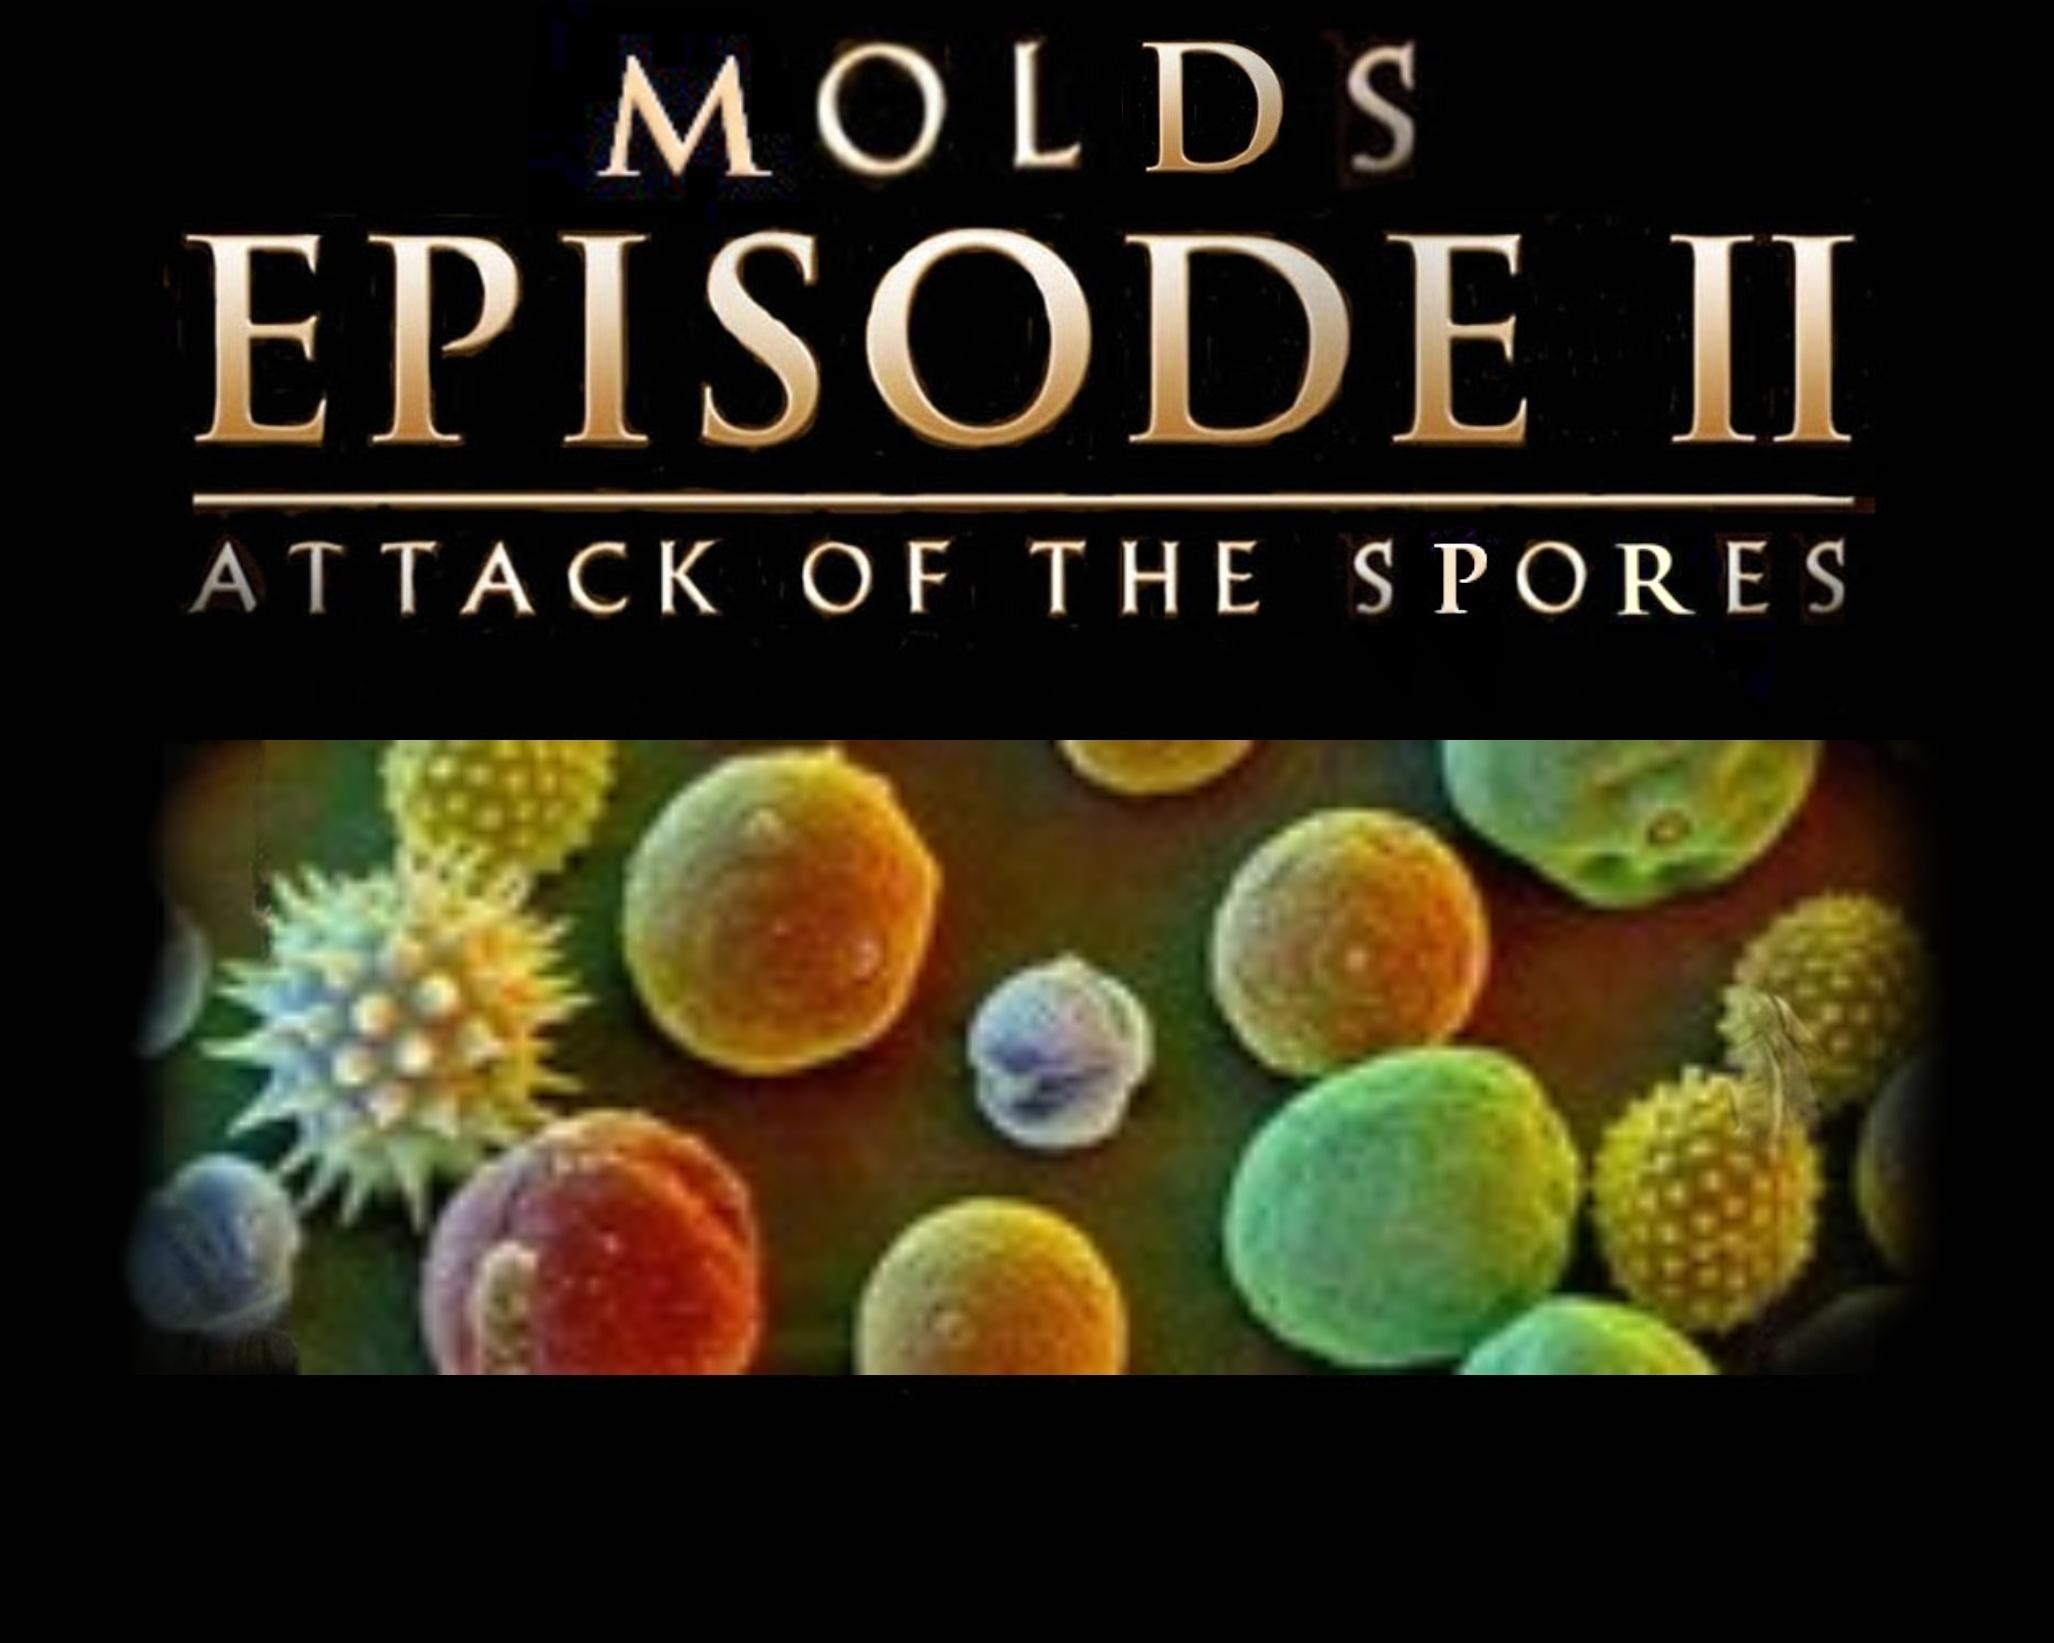 29-Attack Of The Spores